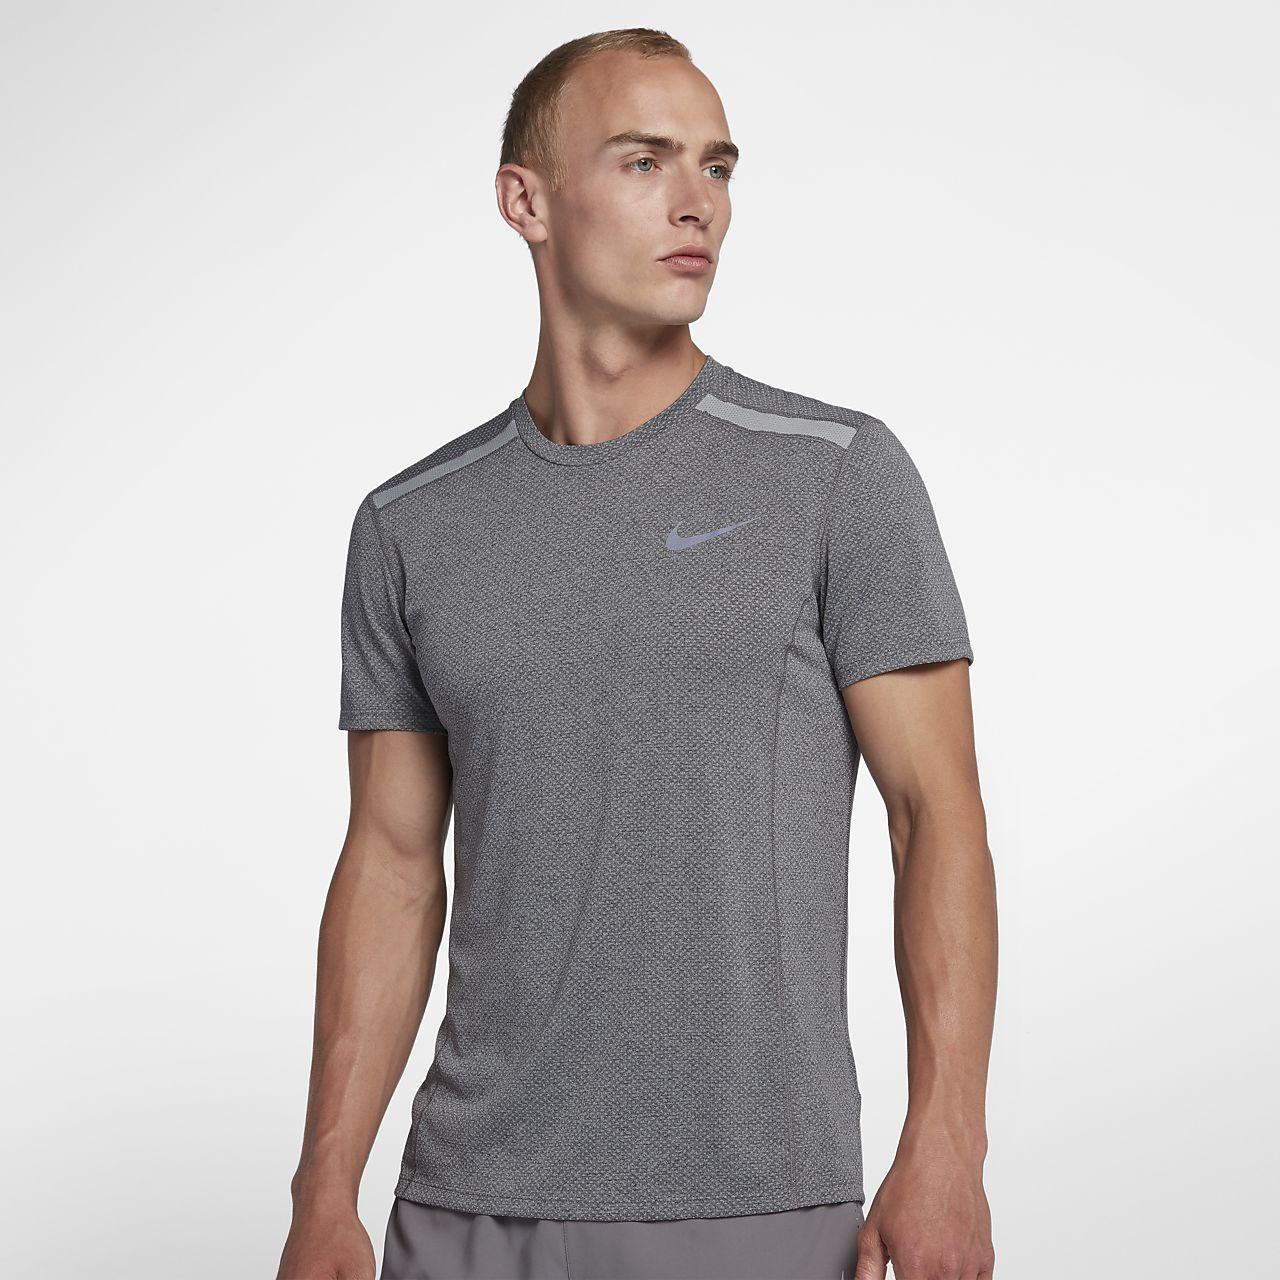 ef6f3df0f631f Nike Dri-FIT Miler Cool Men's Short-Sleeve Running Top. Nike.com GB